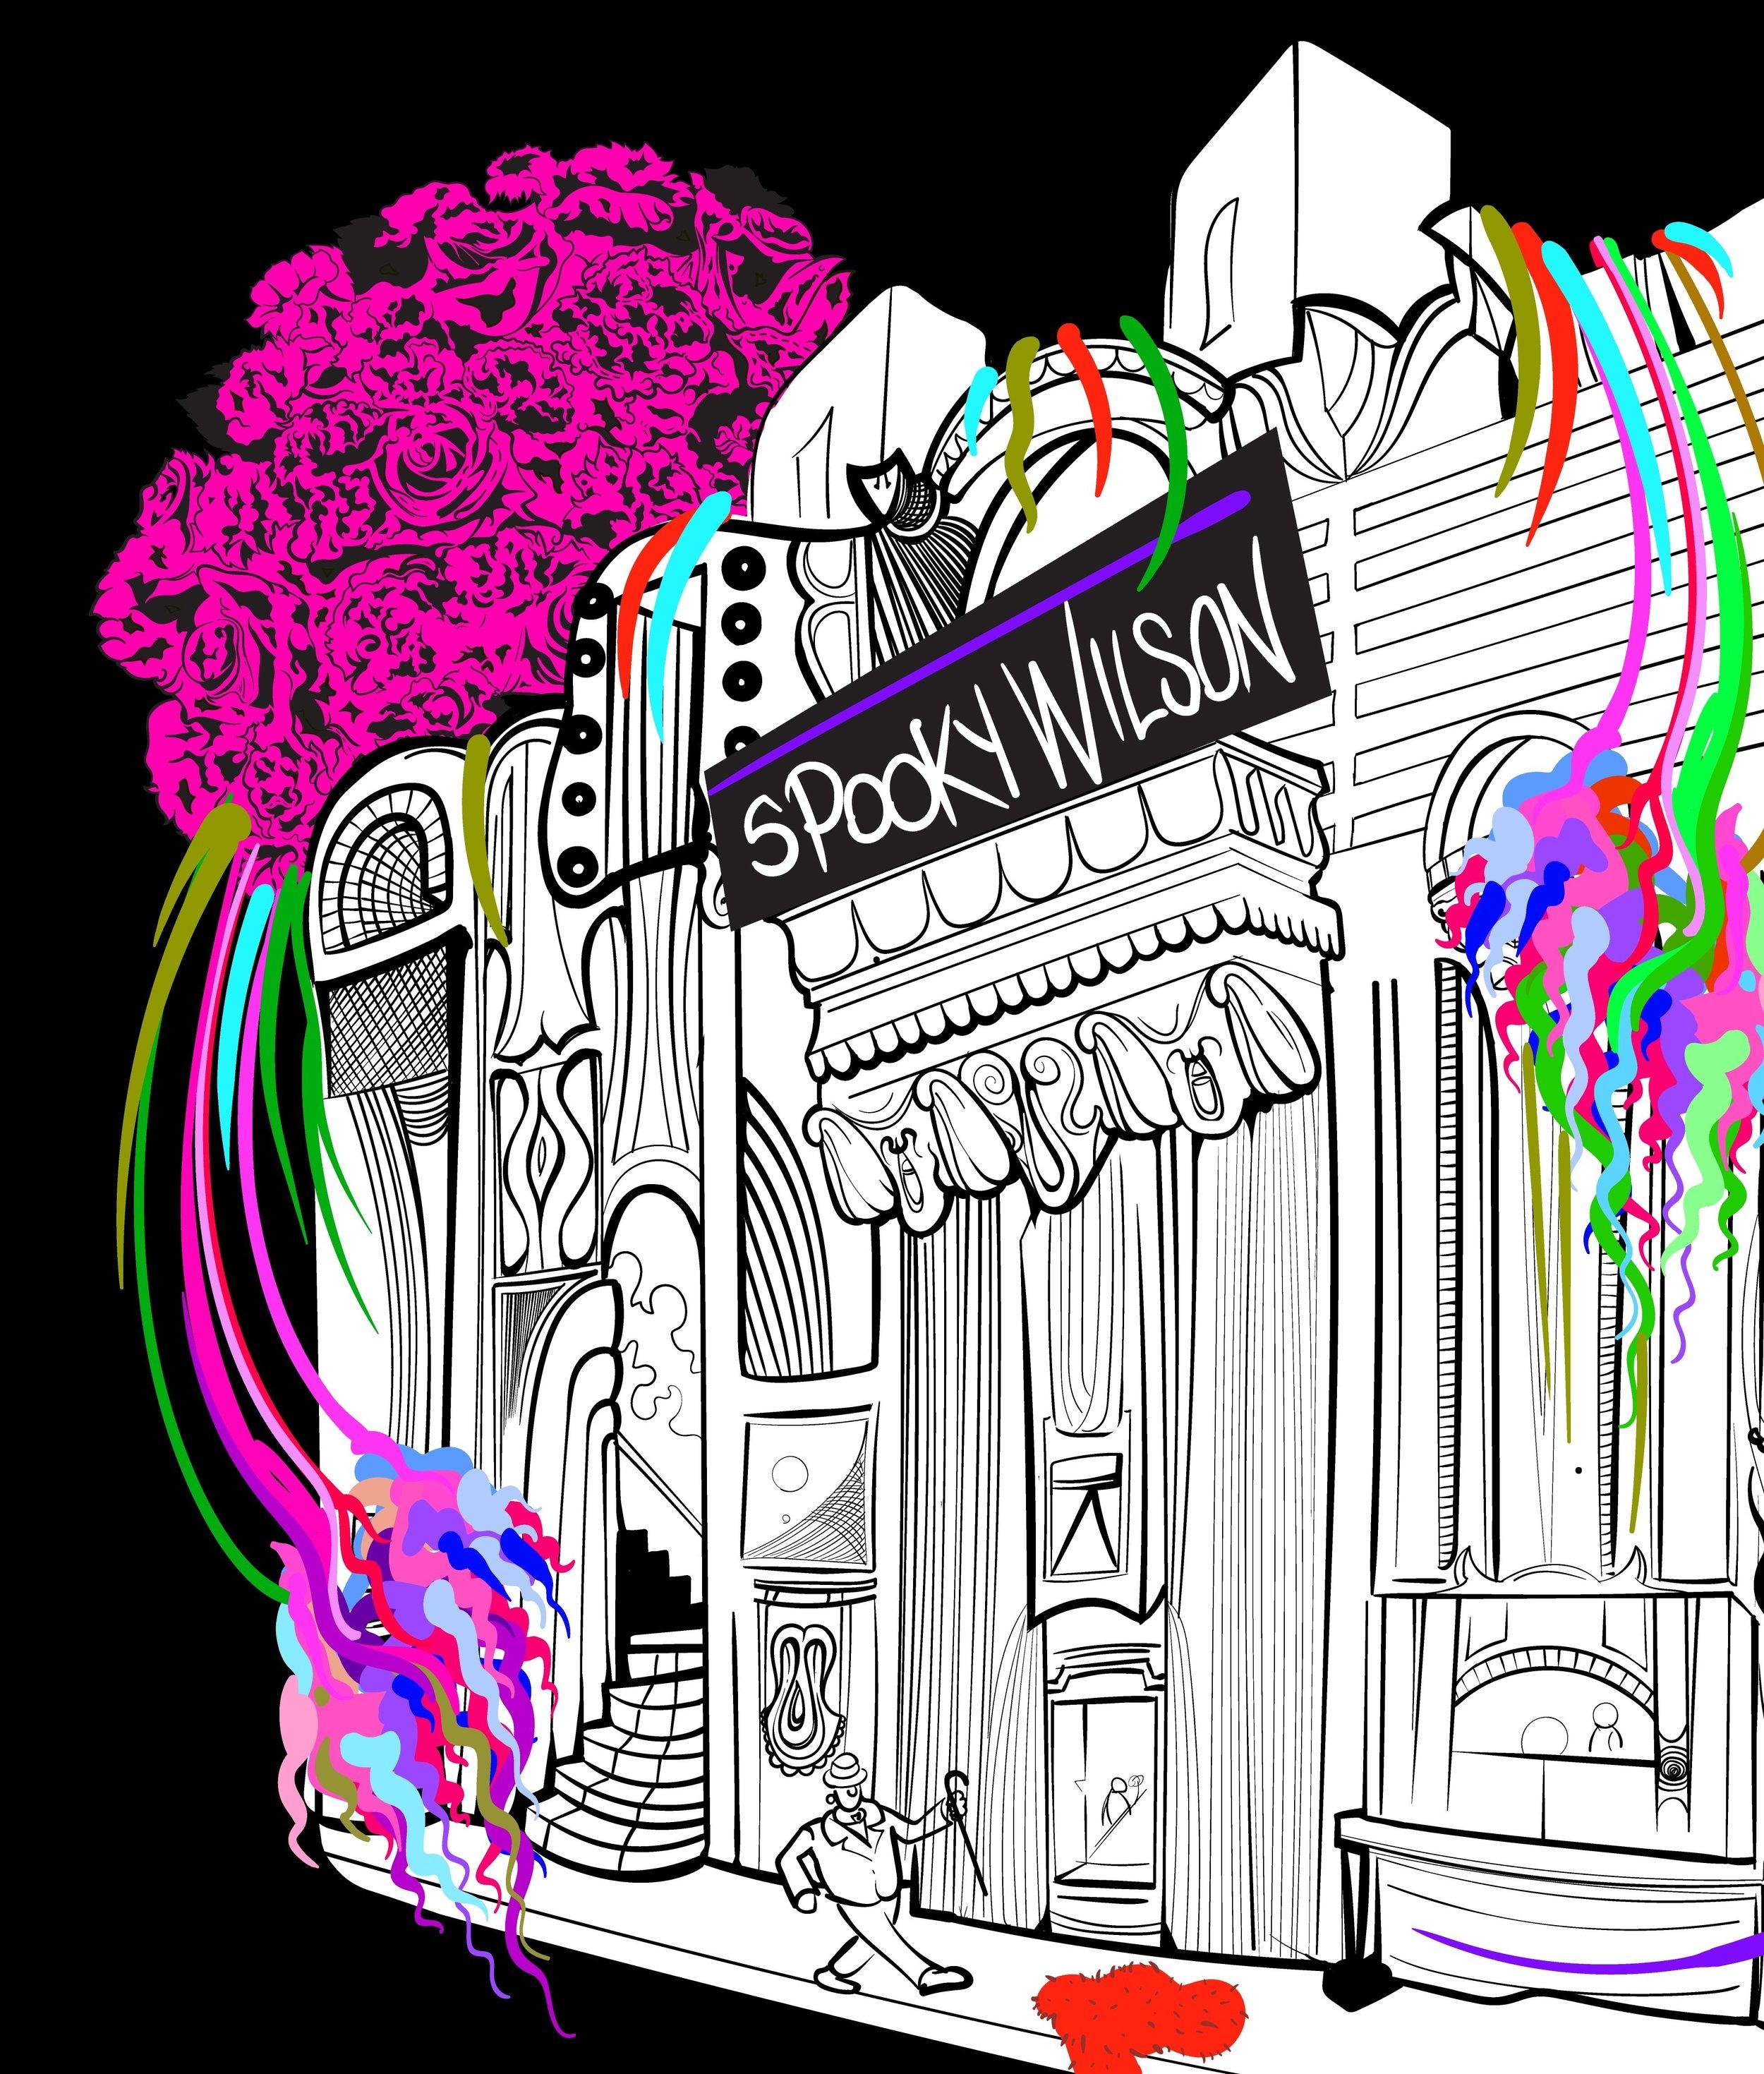 Spooky Wilson - Flame